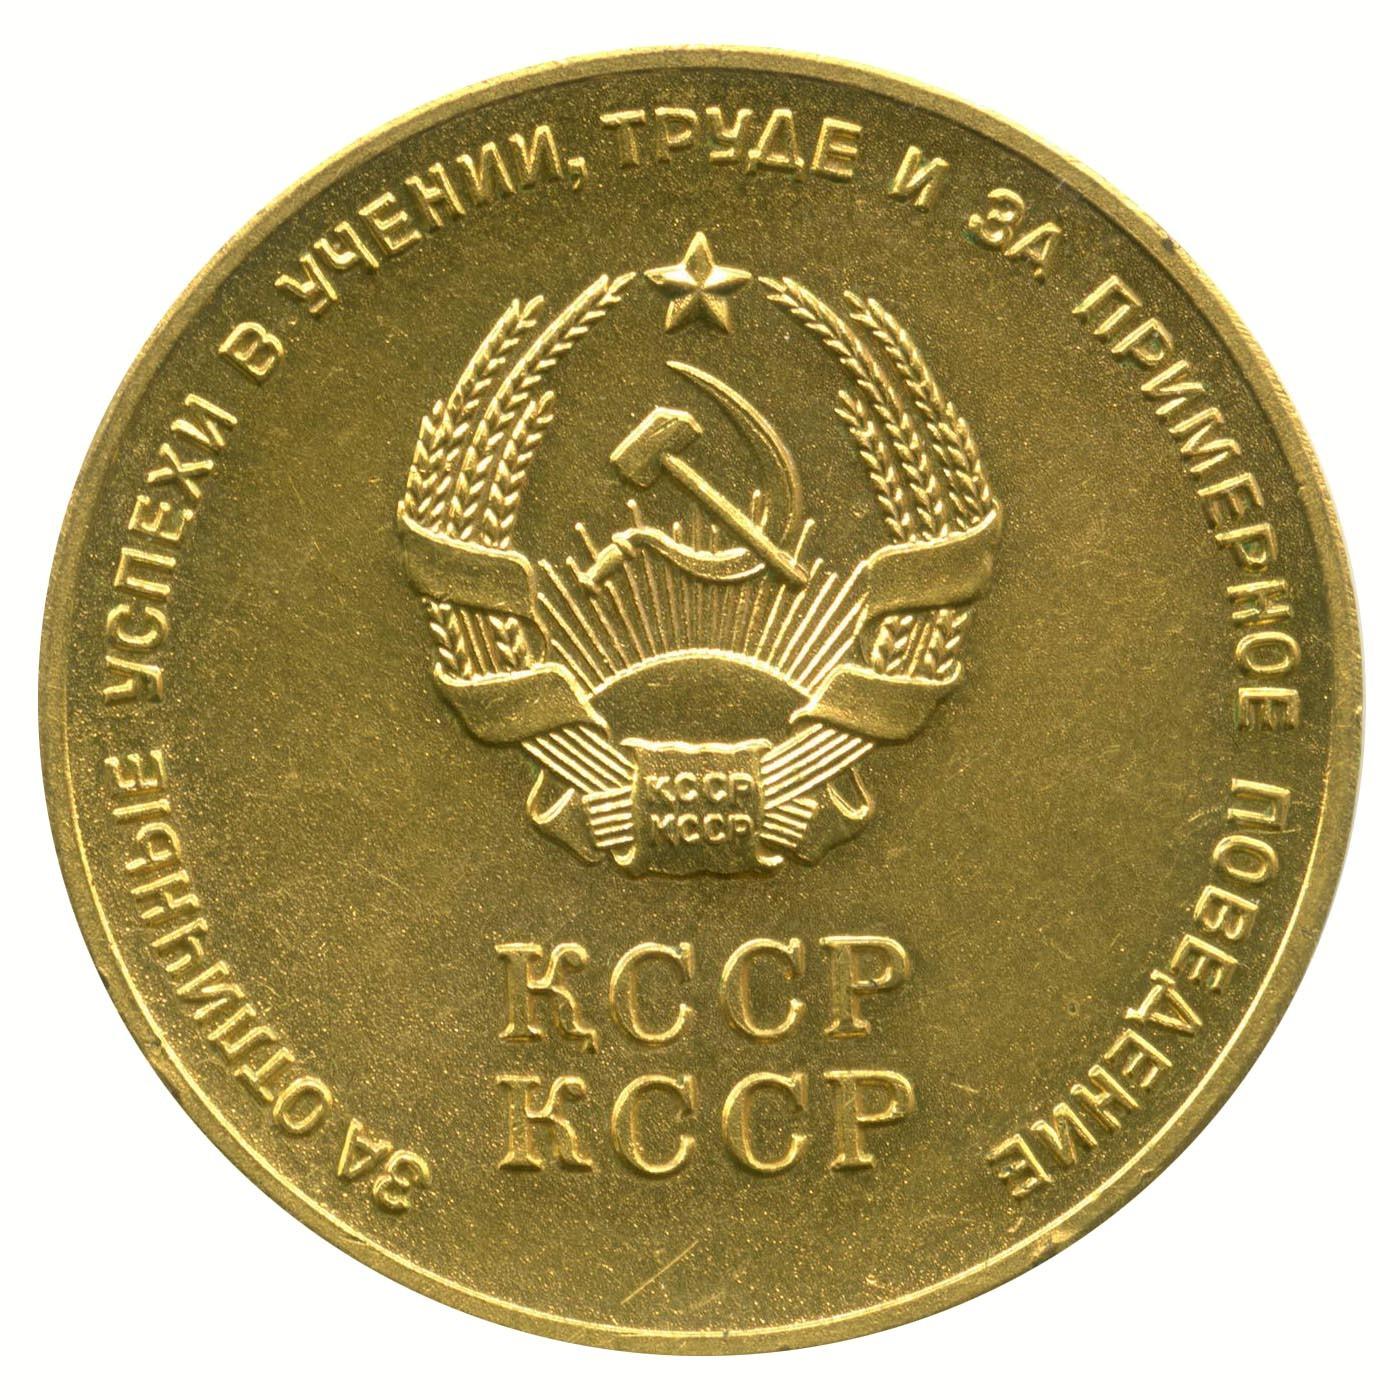 Школьная золотая медаль Казахская ССР 1960 год. XF